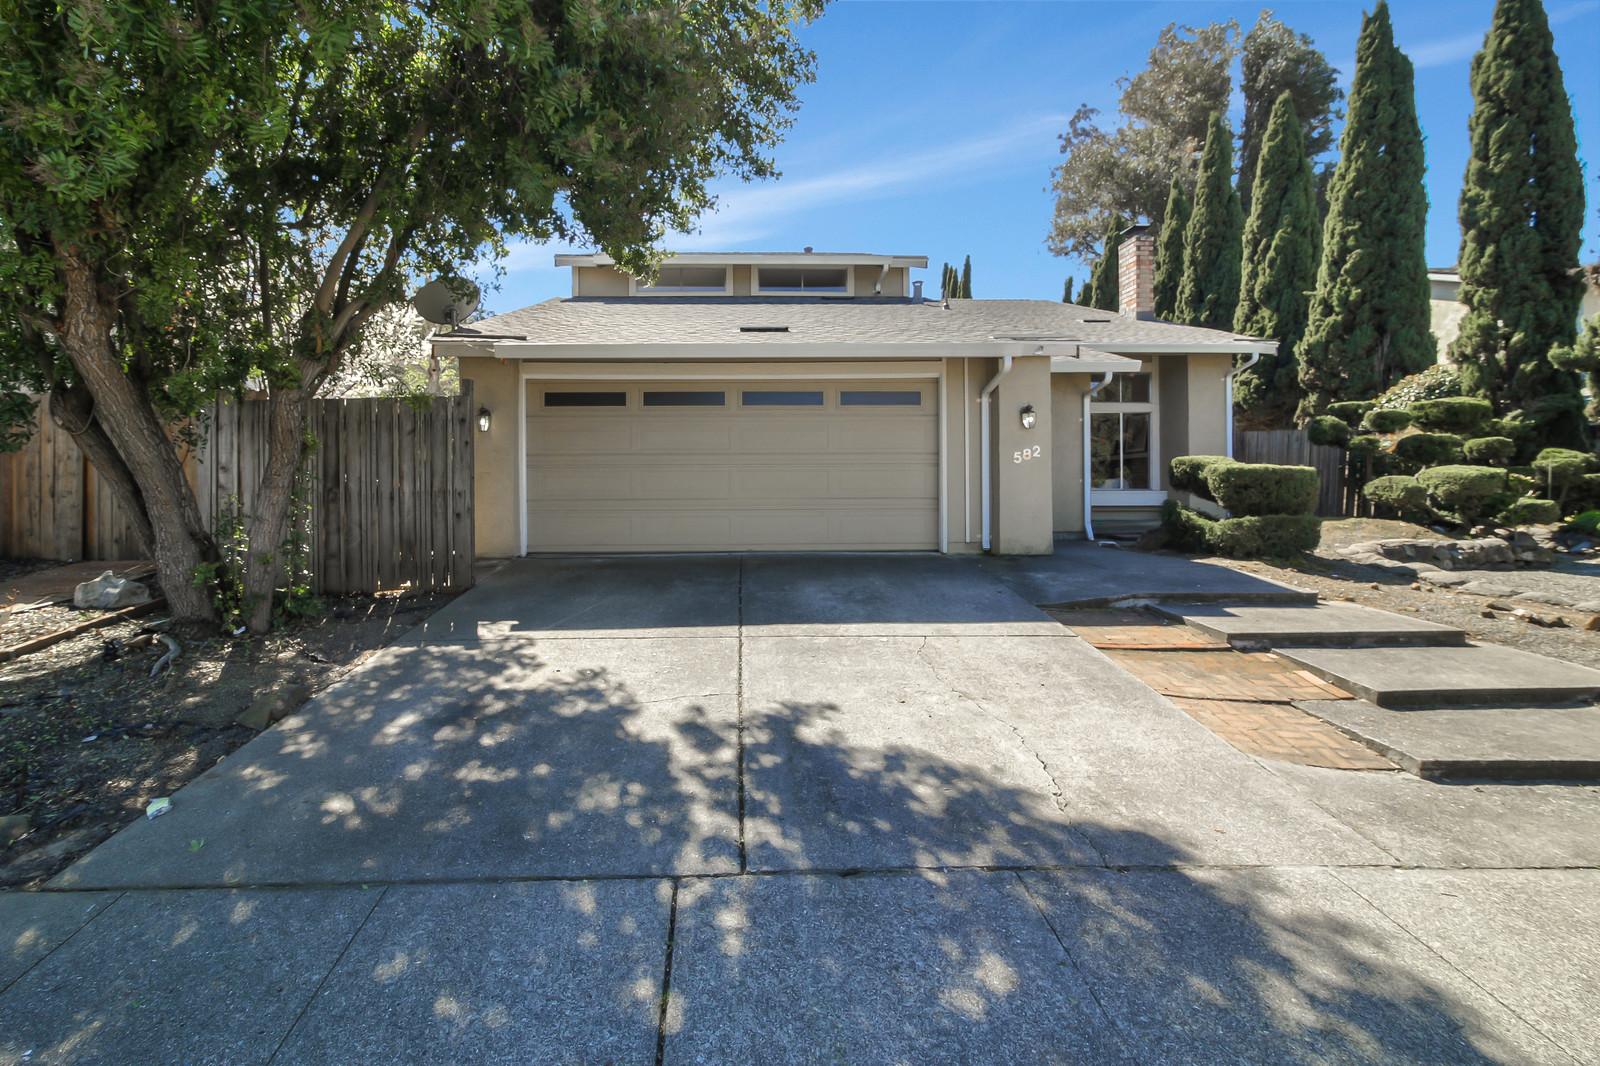 582 Hastings Dr, Benicia, CA